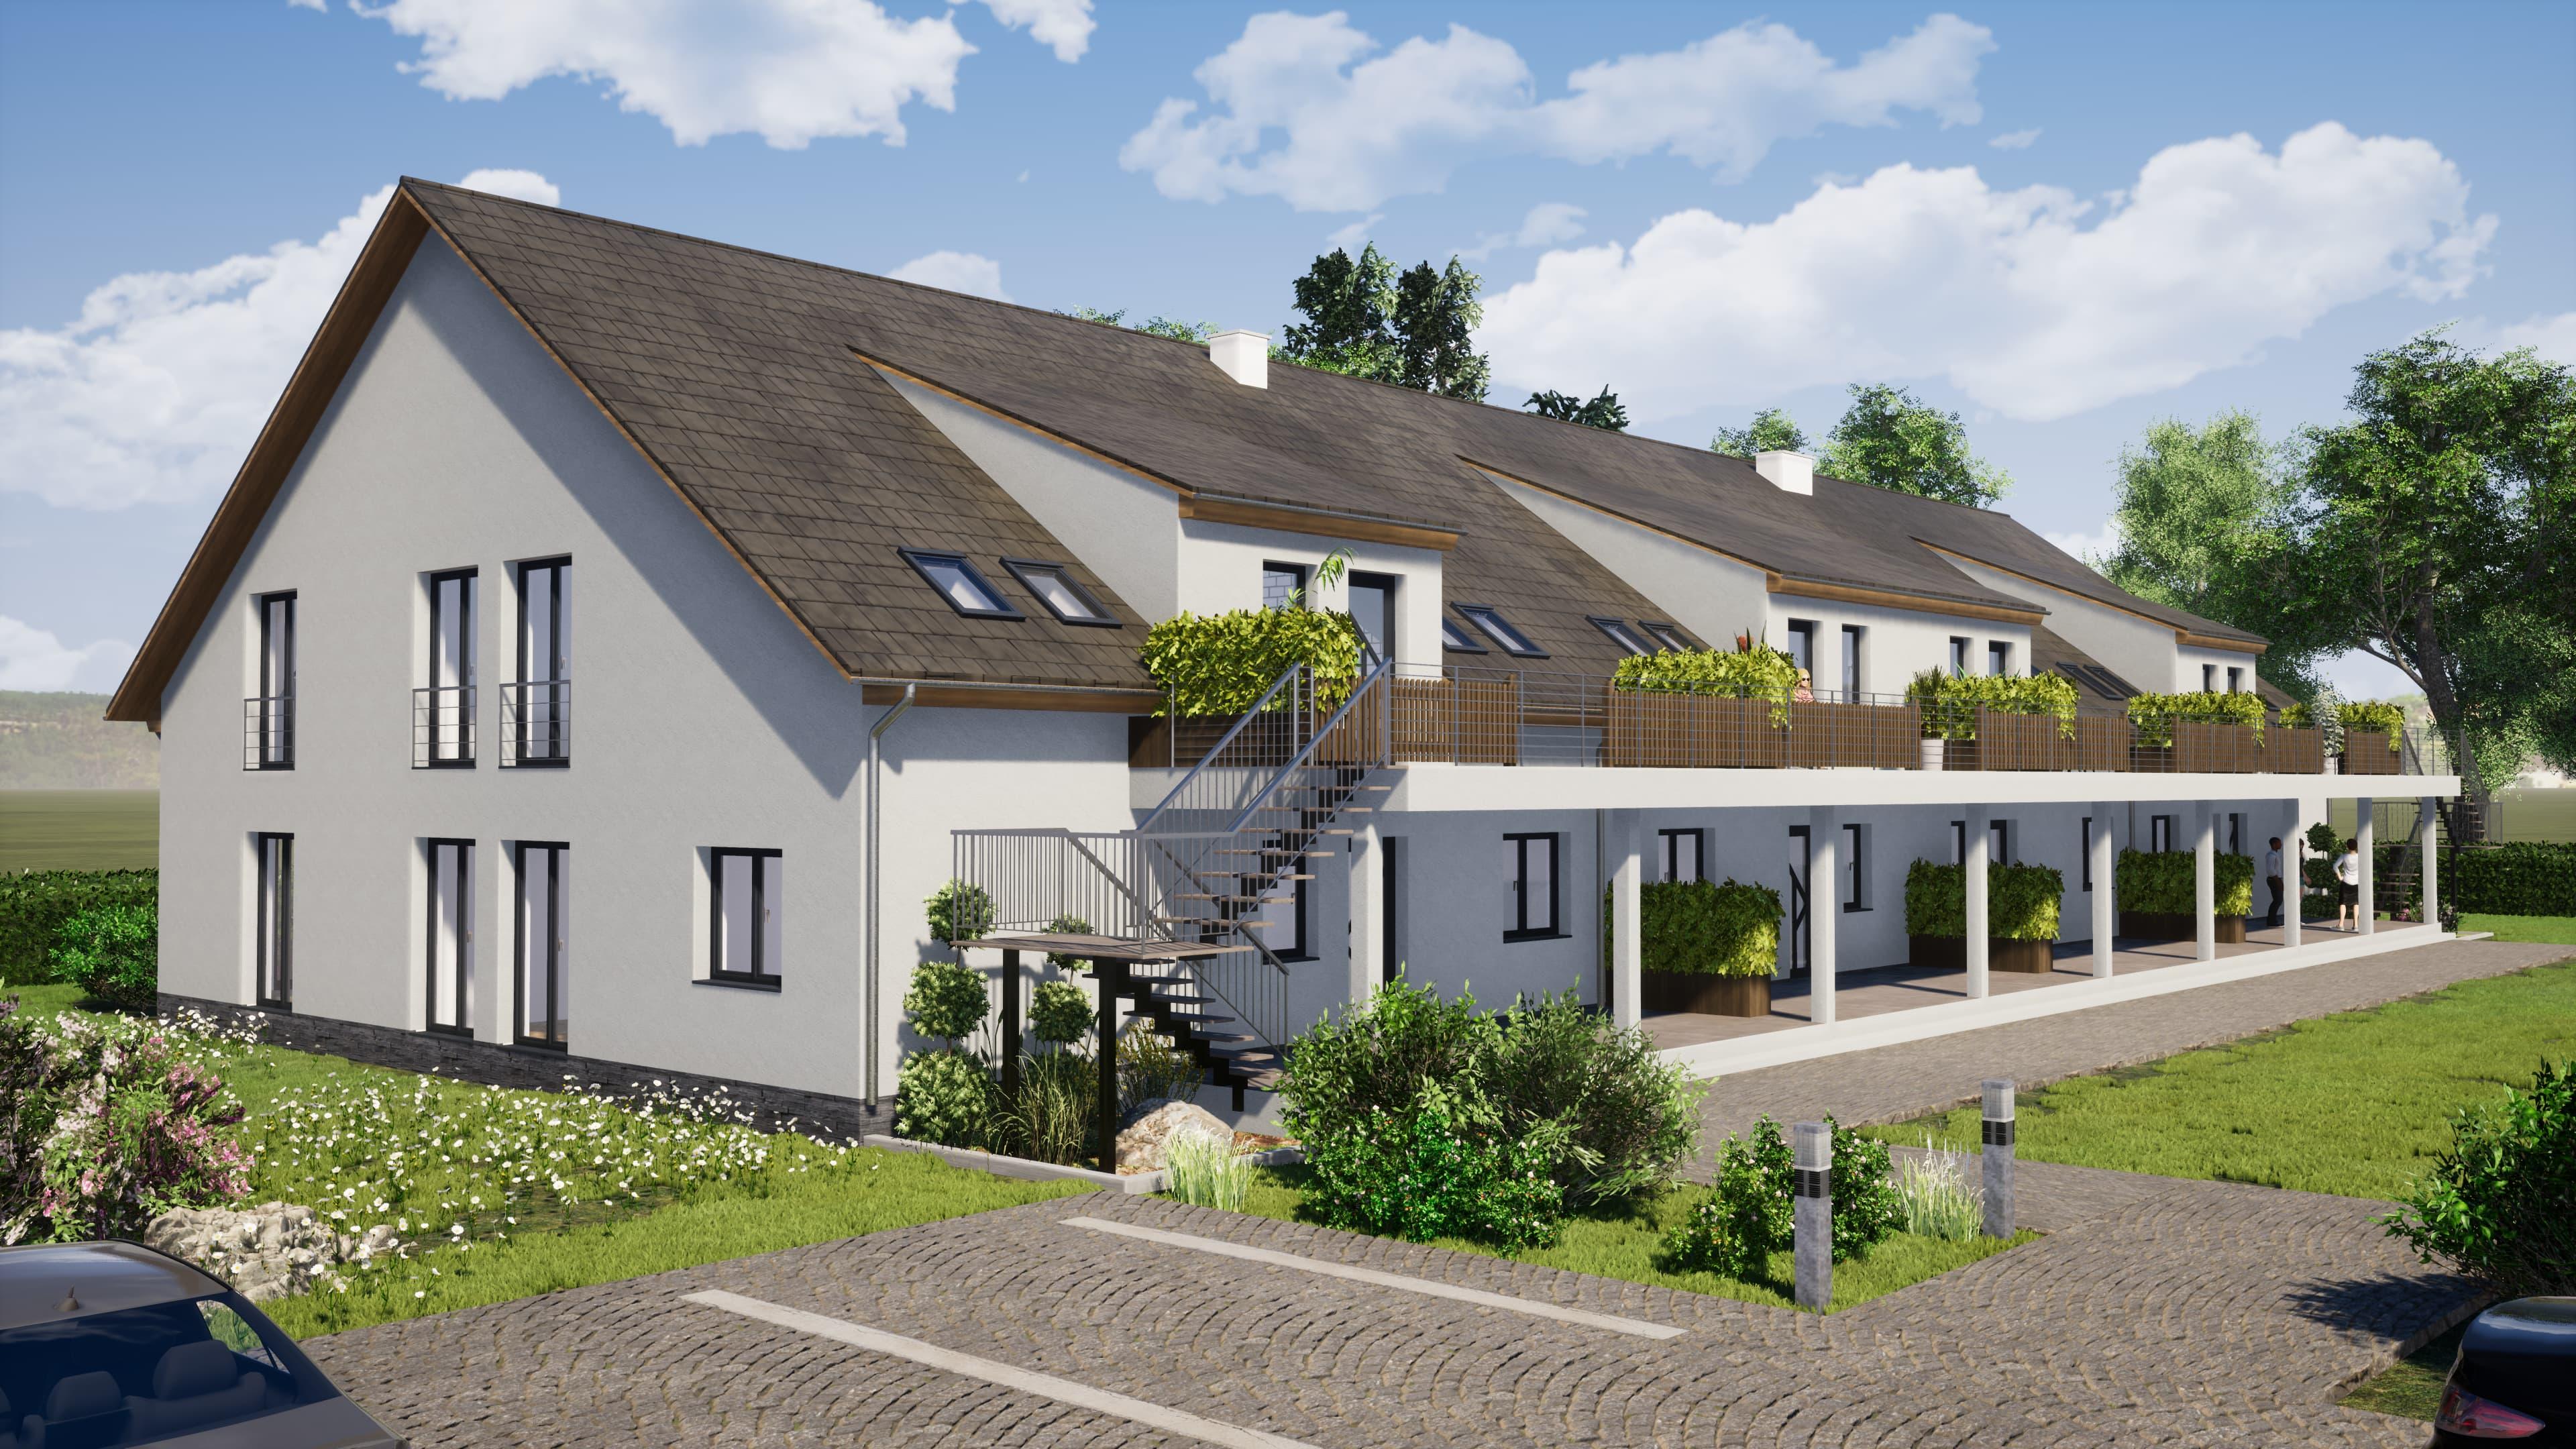 Visualisierung Mehrfamilienhaus Rendering